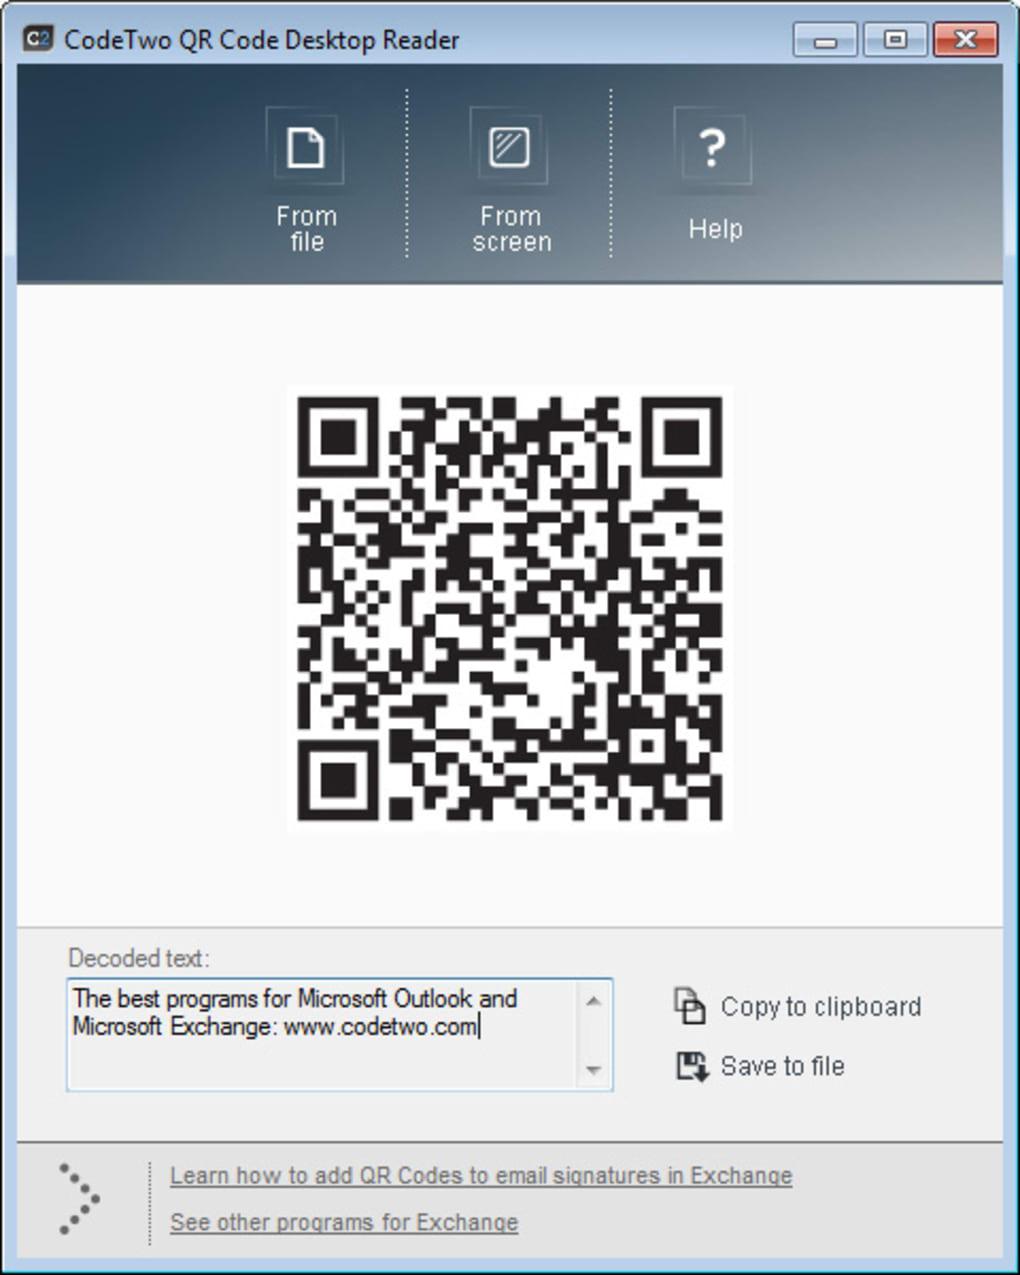 qr code scanner for windows 8.1